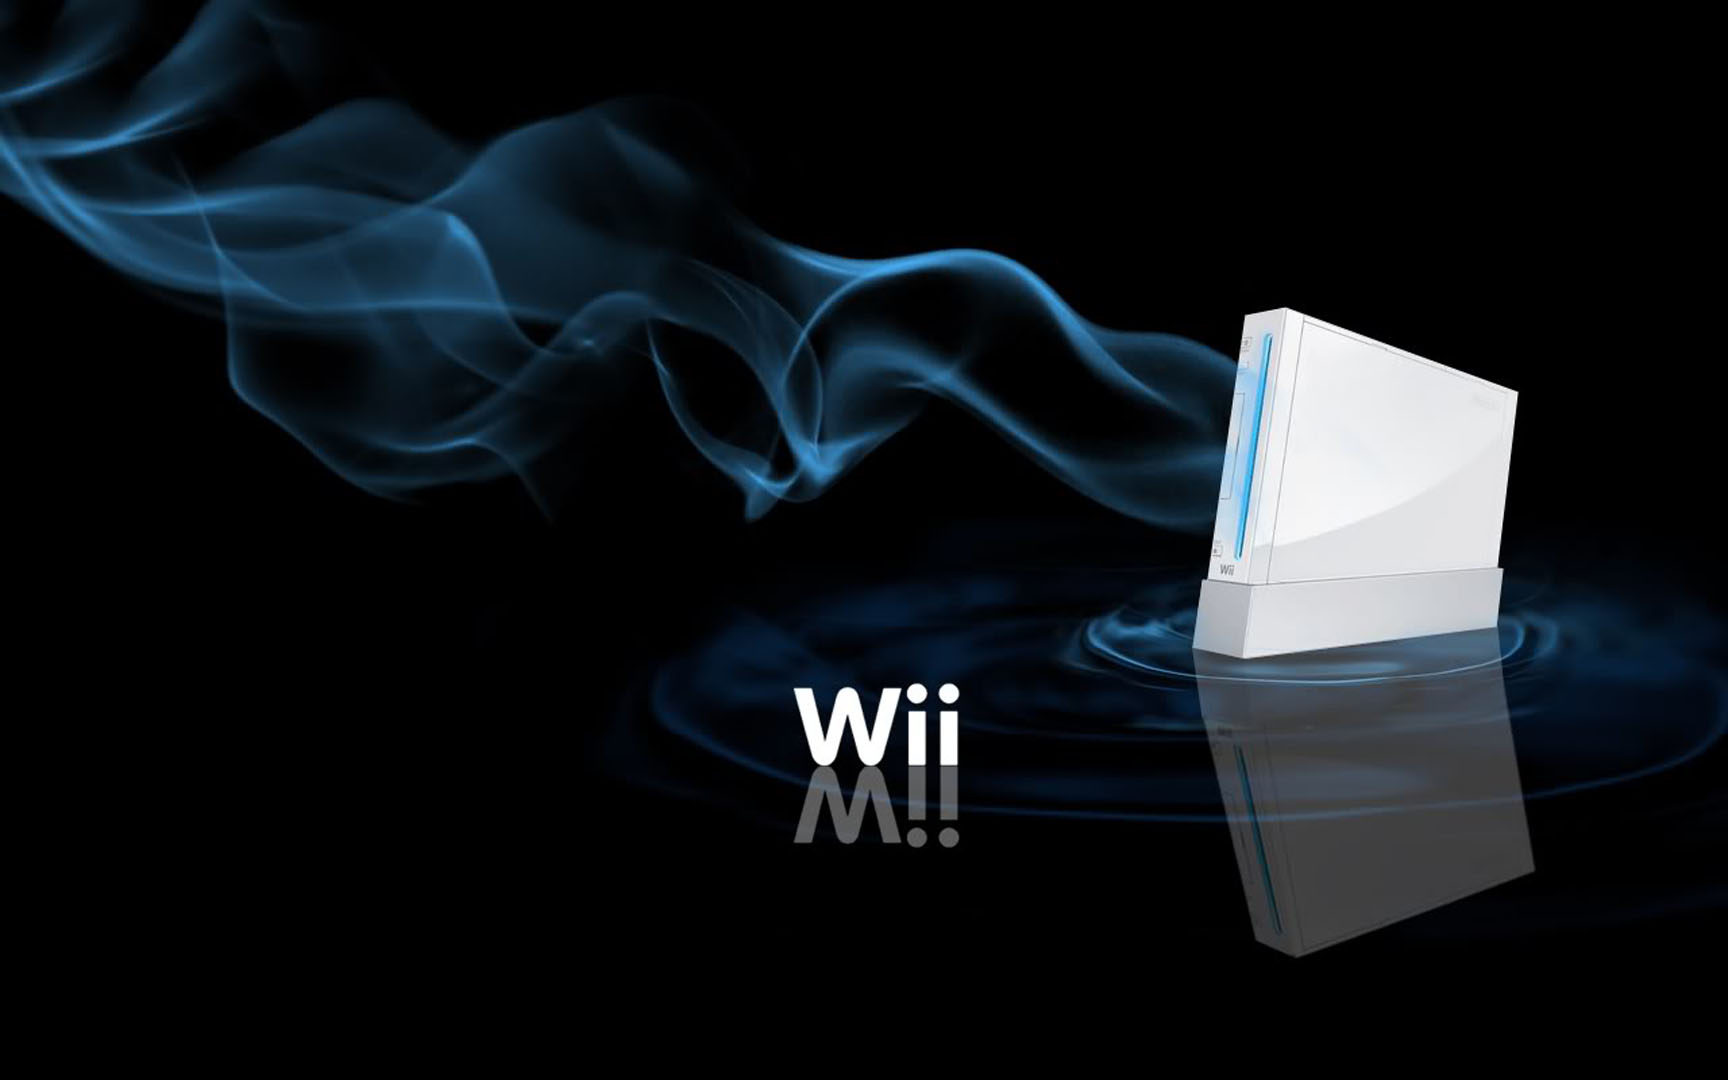 Smoking Wii